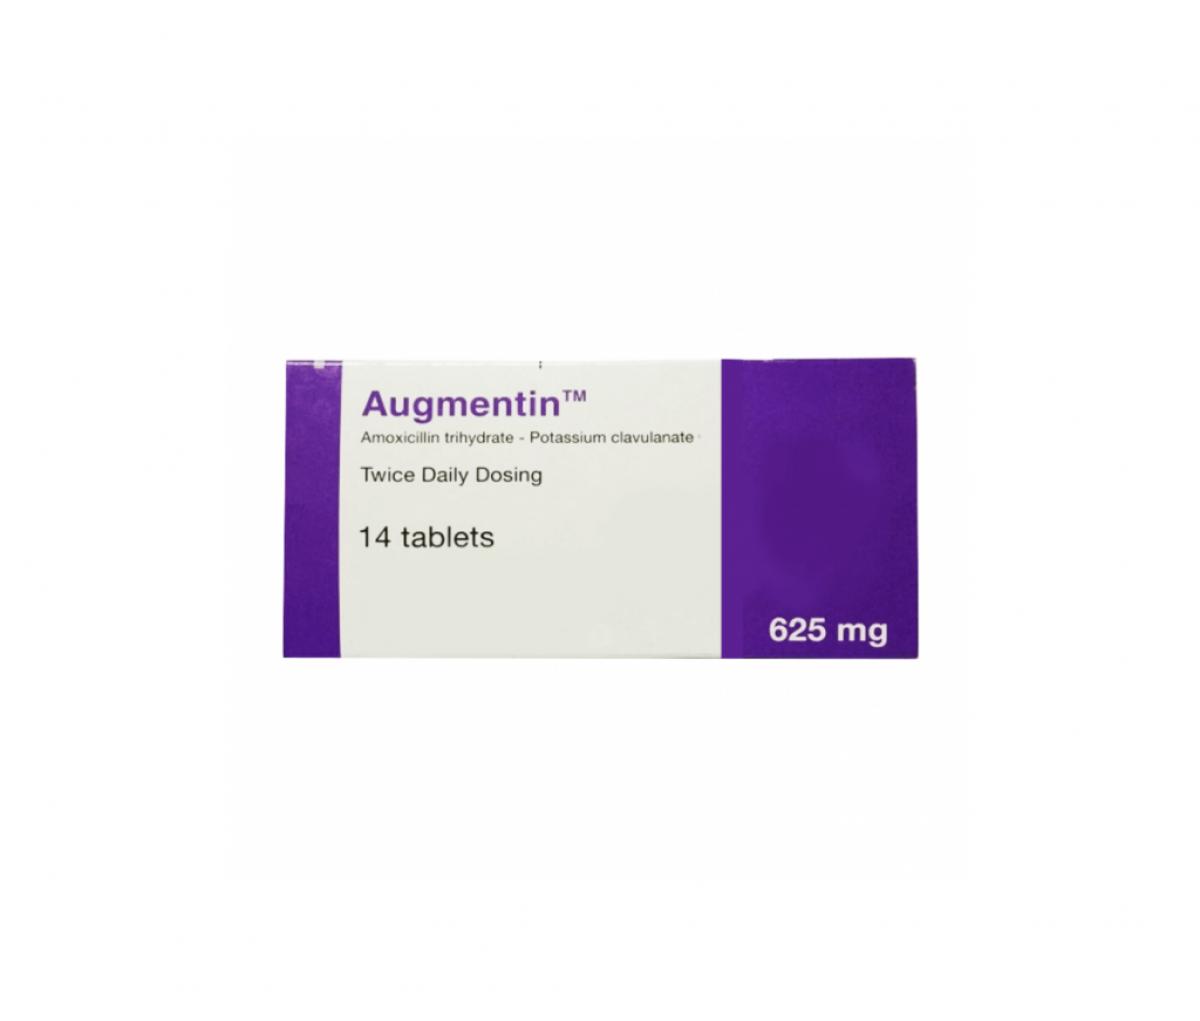 Augmentin 625mg Tablet